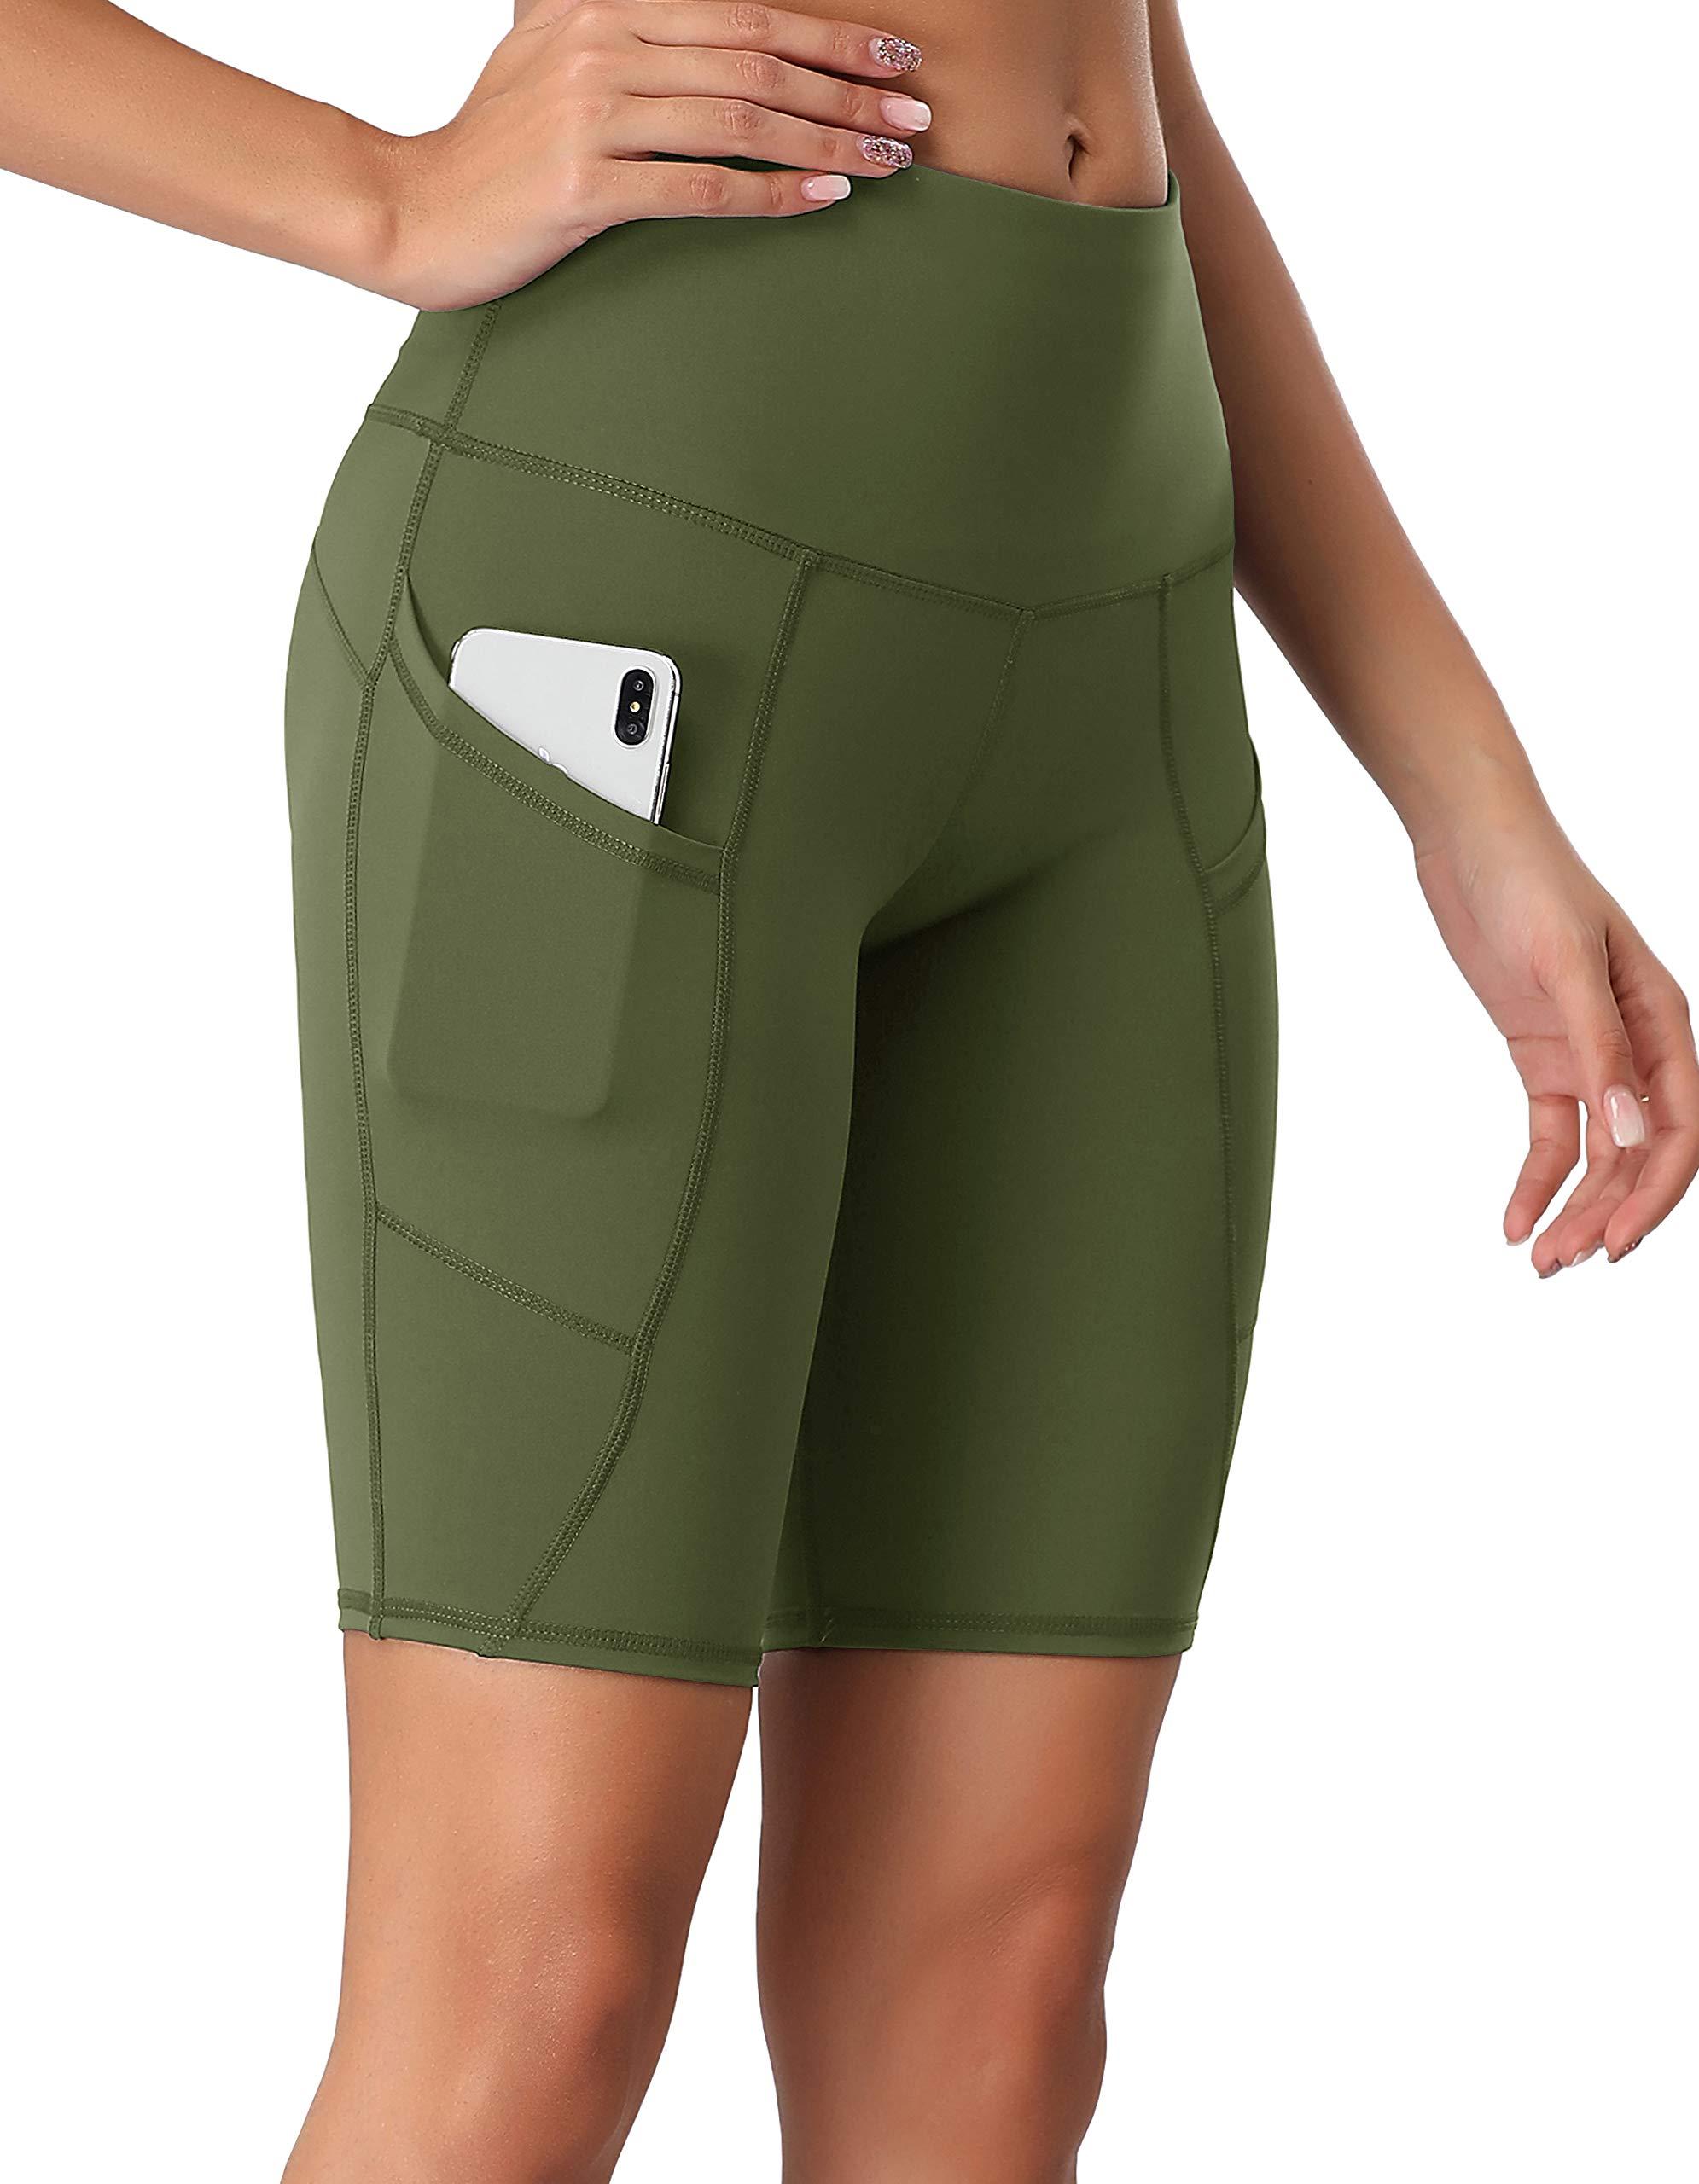 Oalka Women's Short Yoga Side Pockets High Waist Workout Running Shorts Army Green S by Oalka